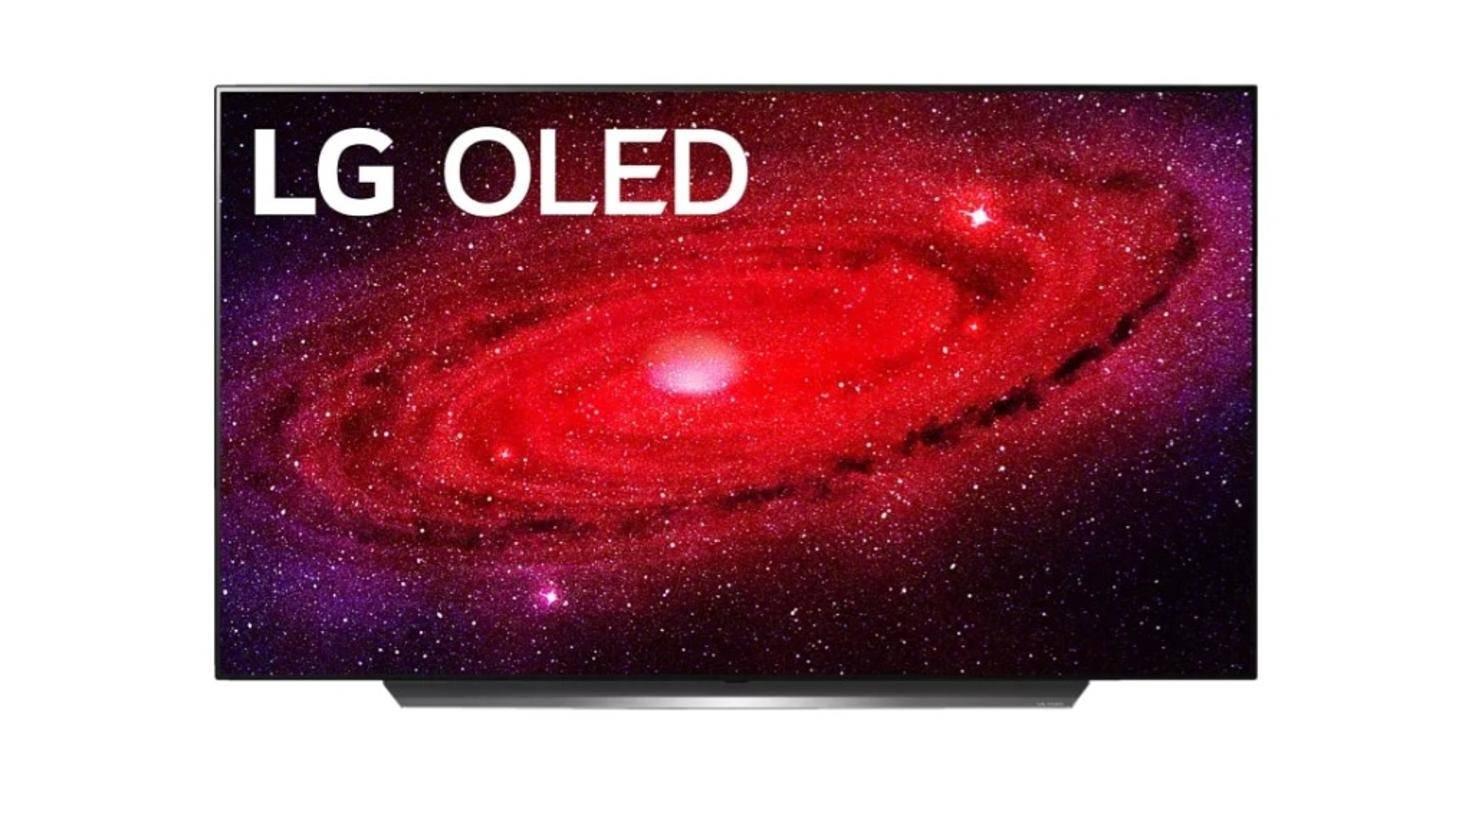 LG-CX9LA OLED TV